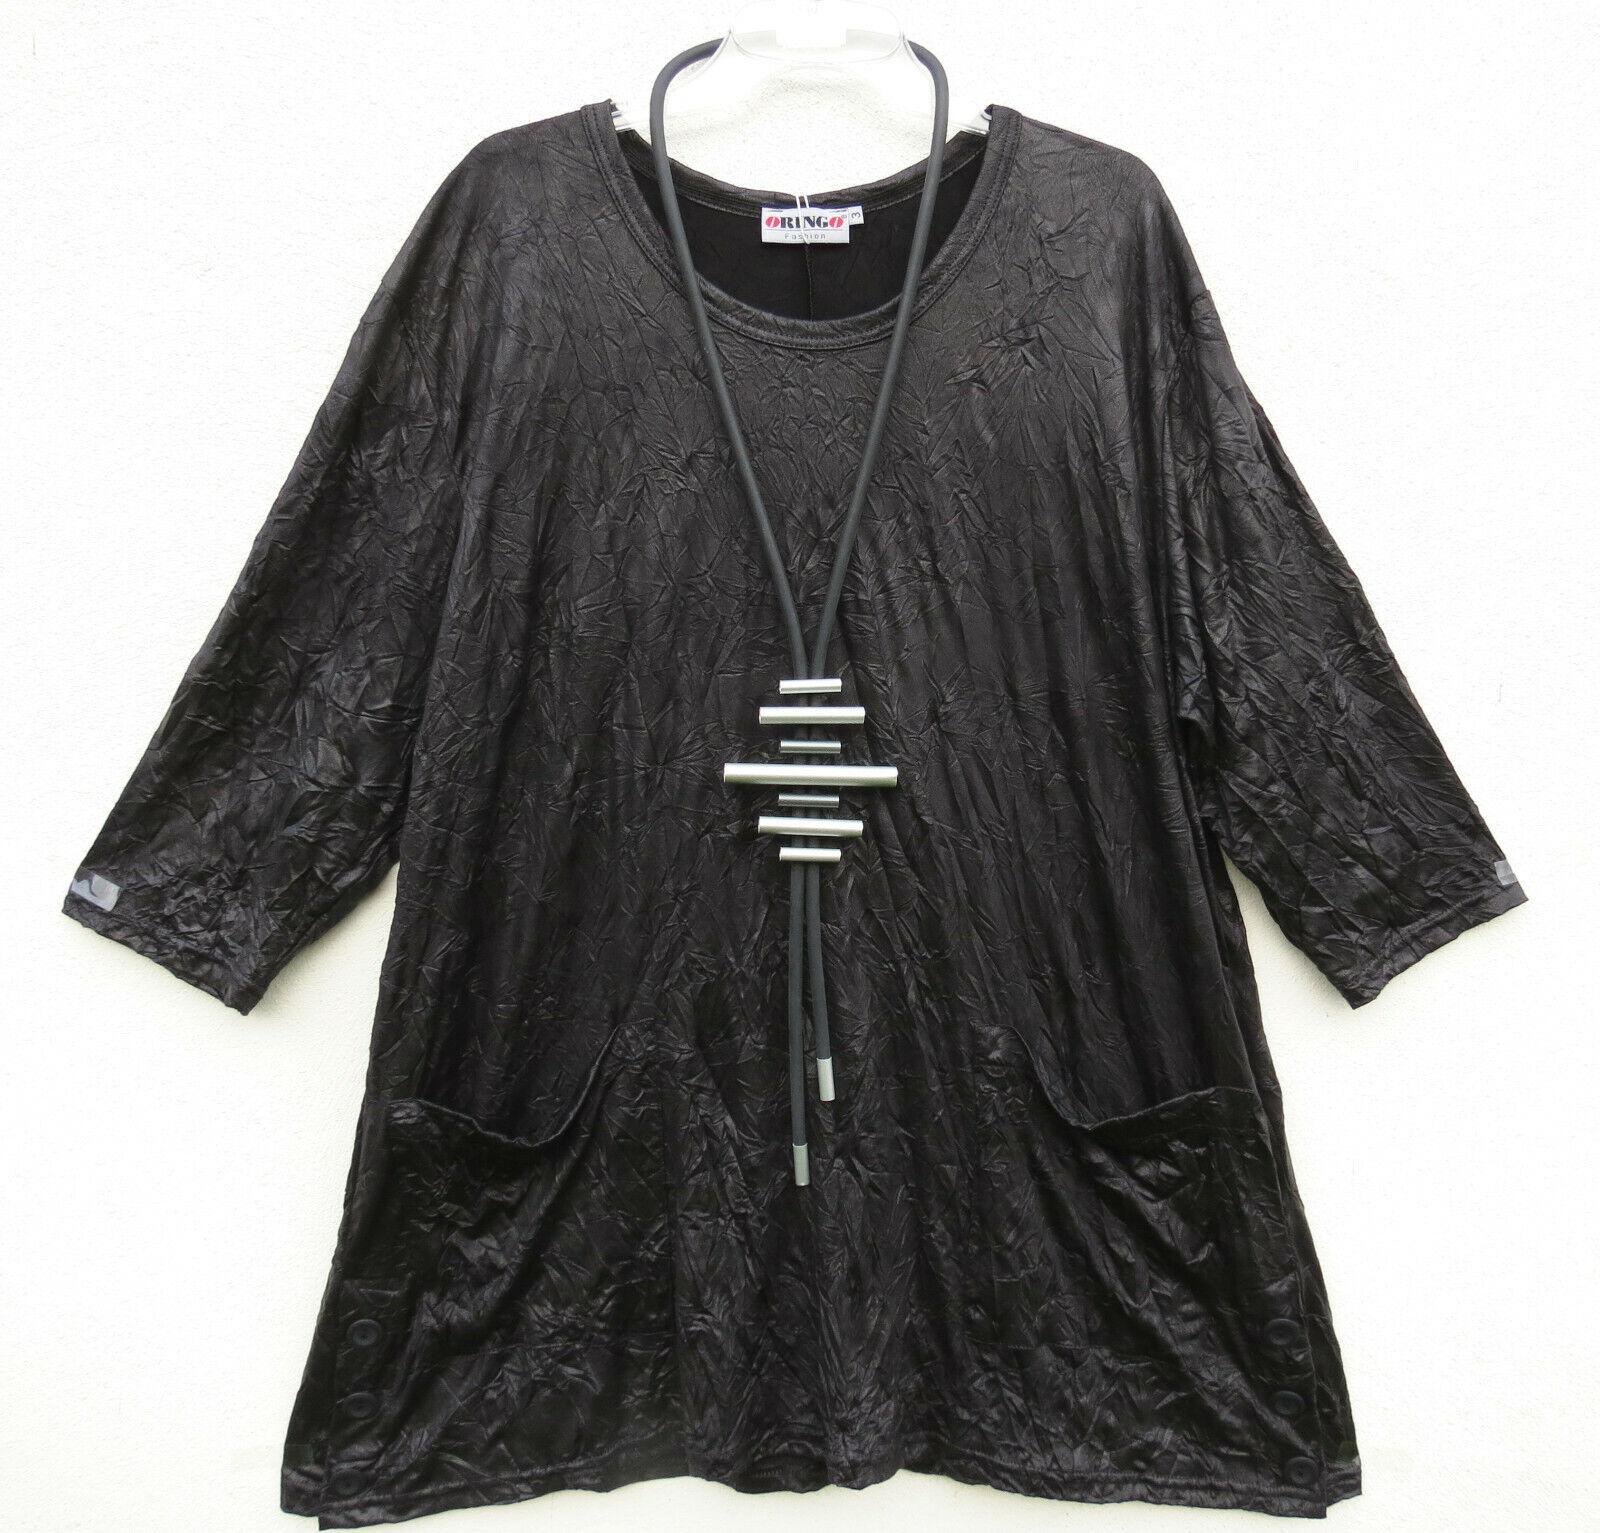 Oringo schwarze Crinkel tunique shirt tunic tunique au XL 48 50 Look